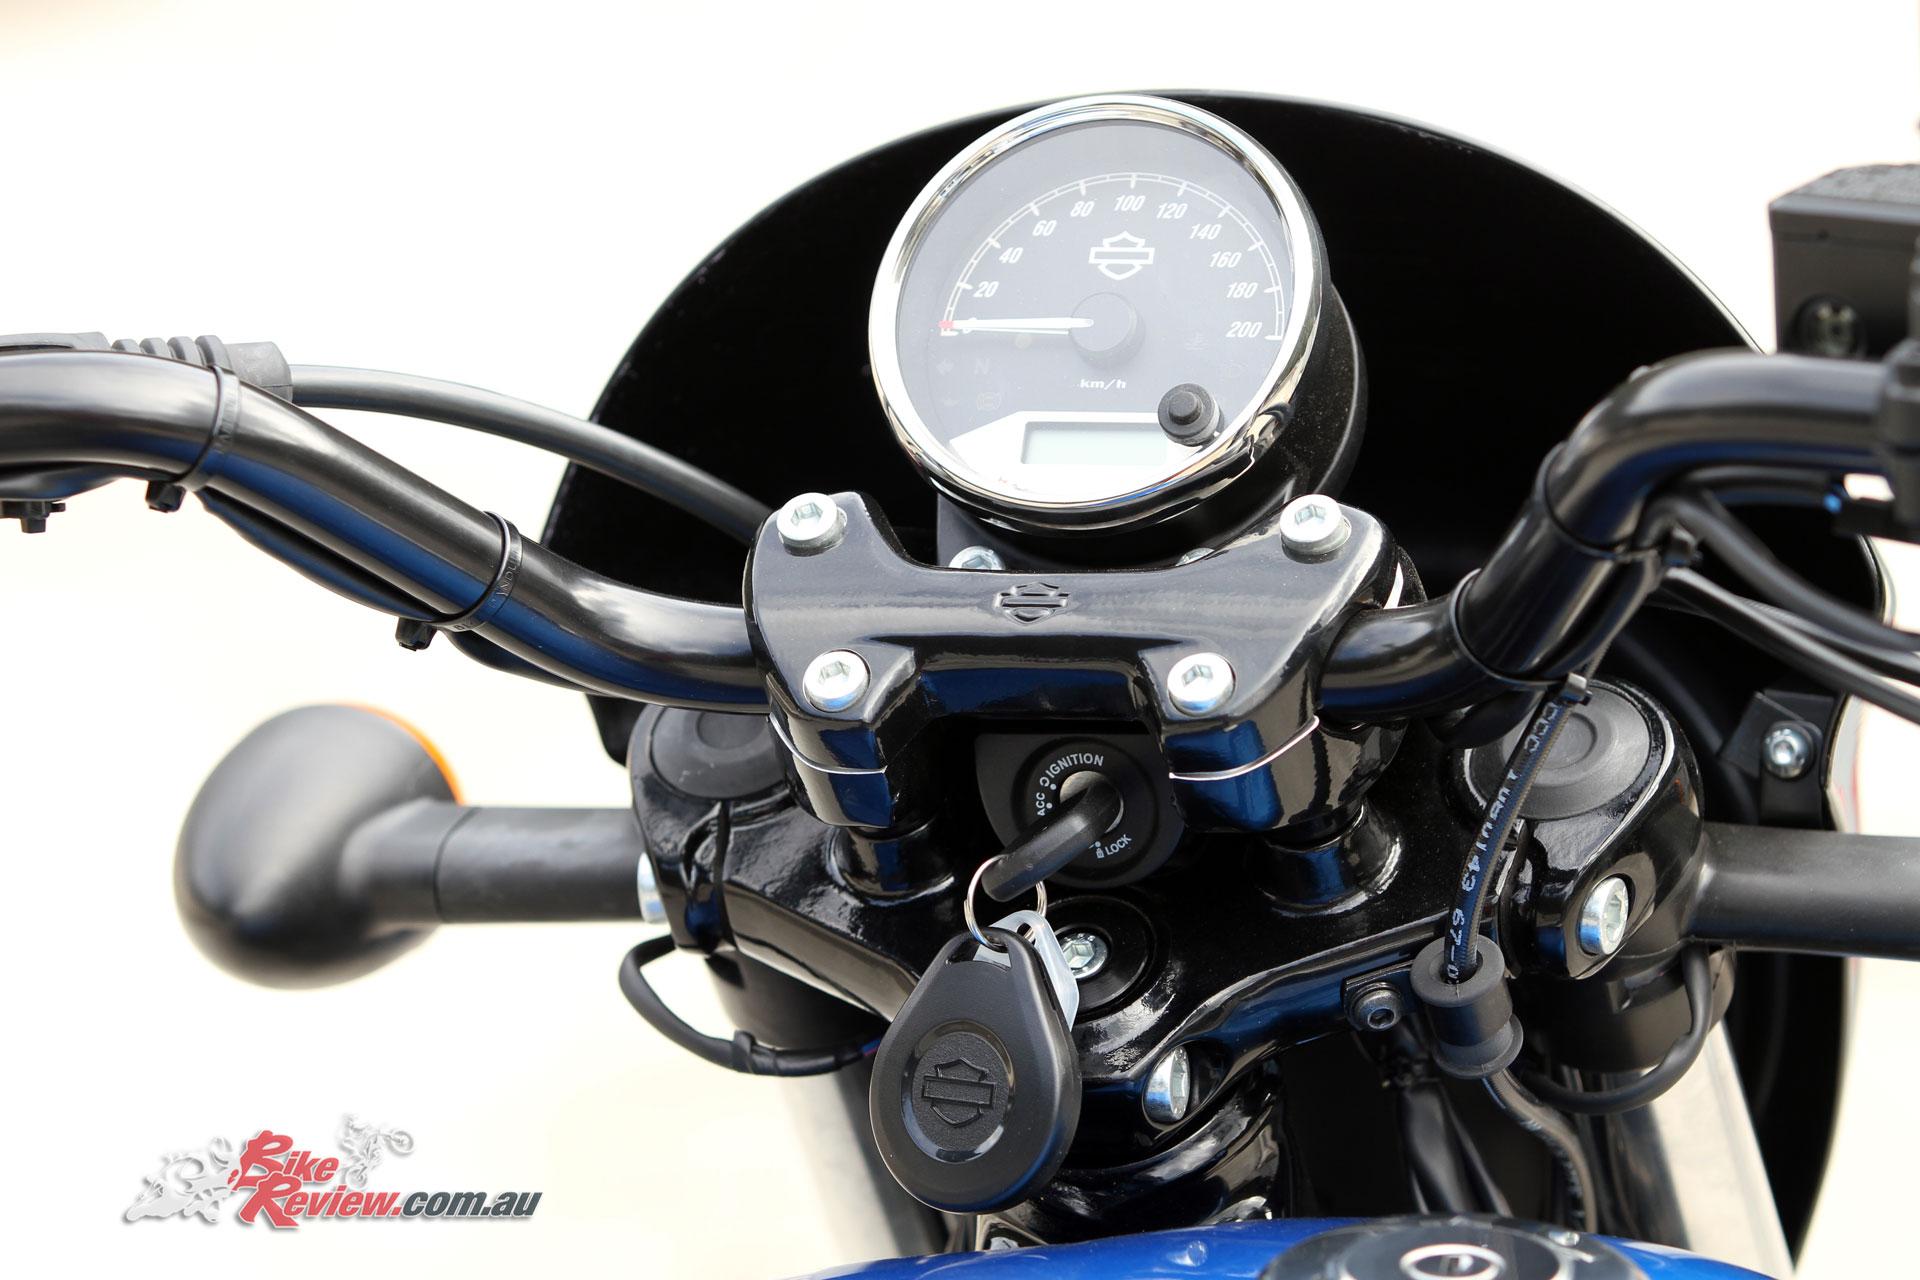 Review: Harley-Davidson Street 500 (LAMS) - Bike Review